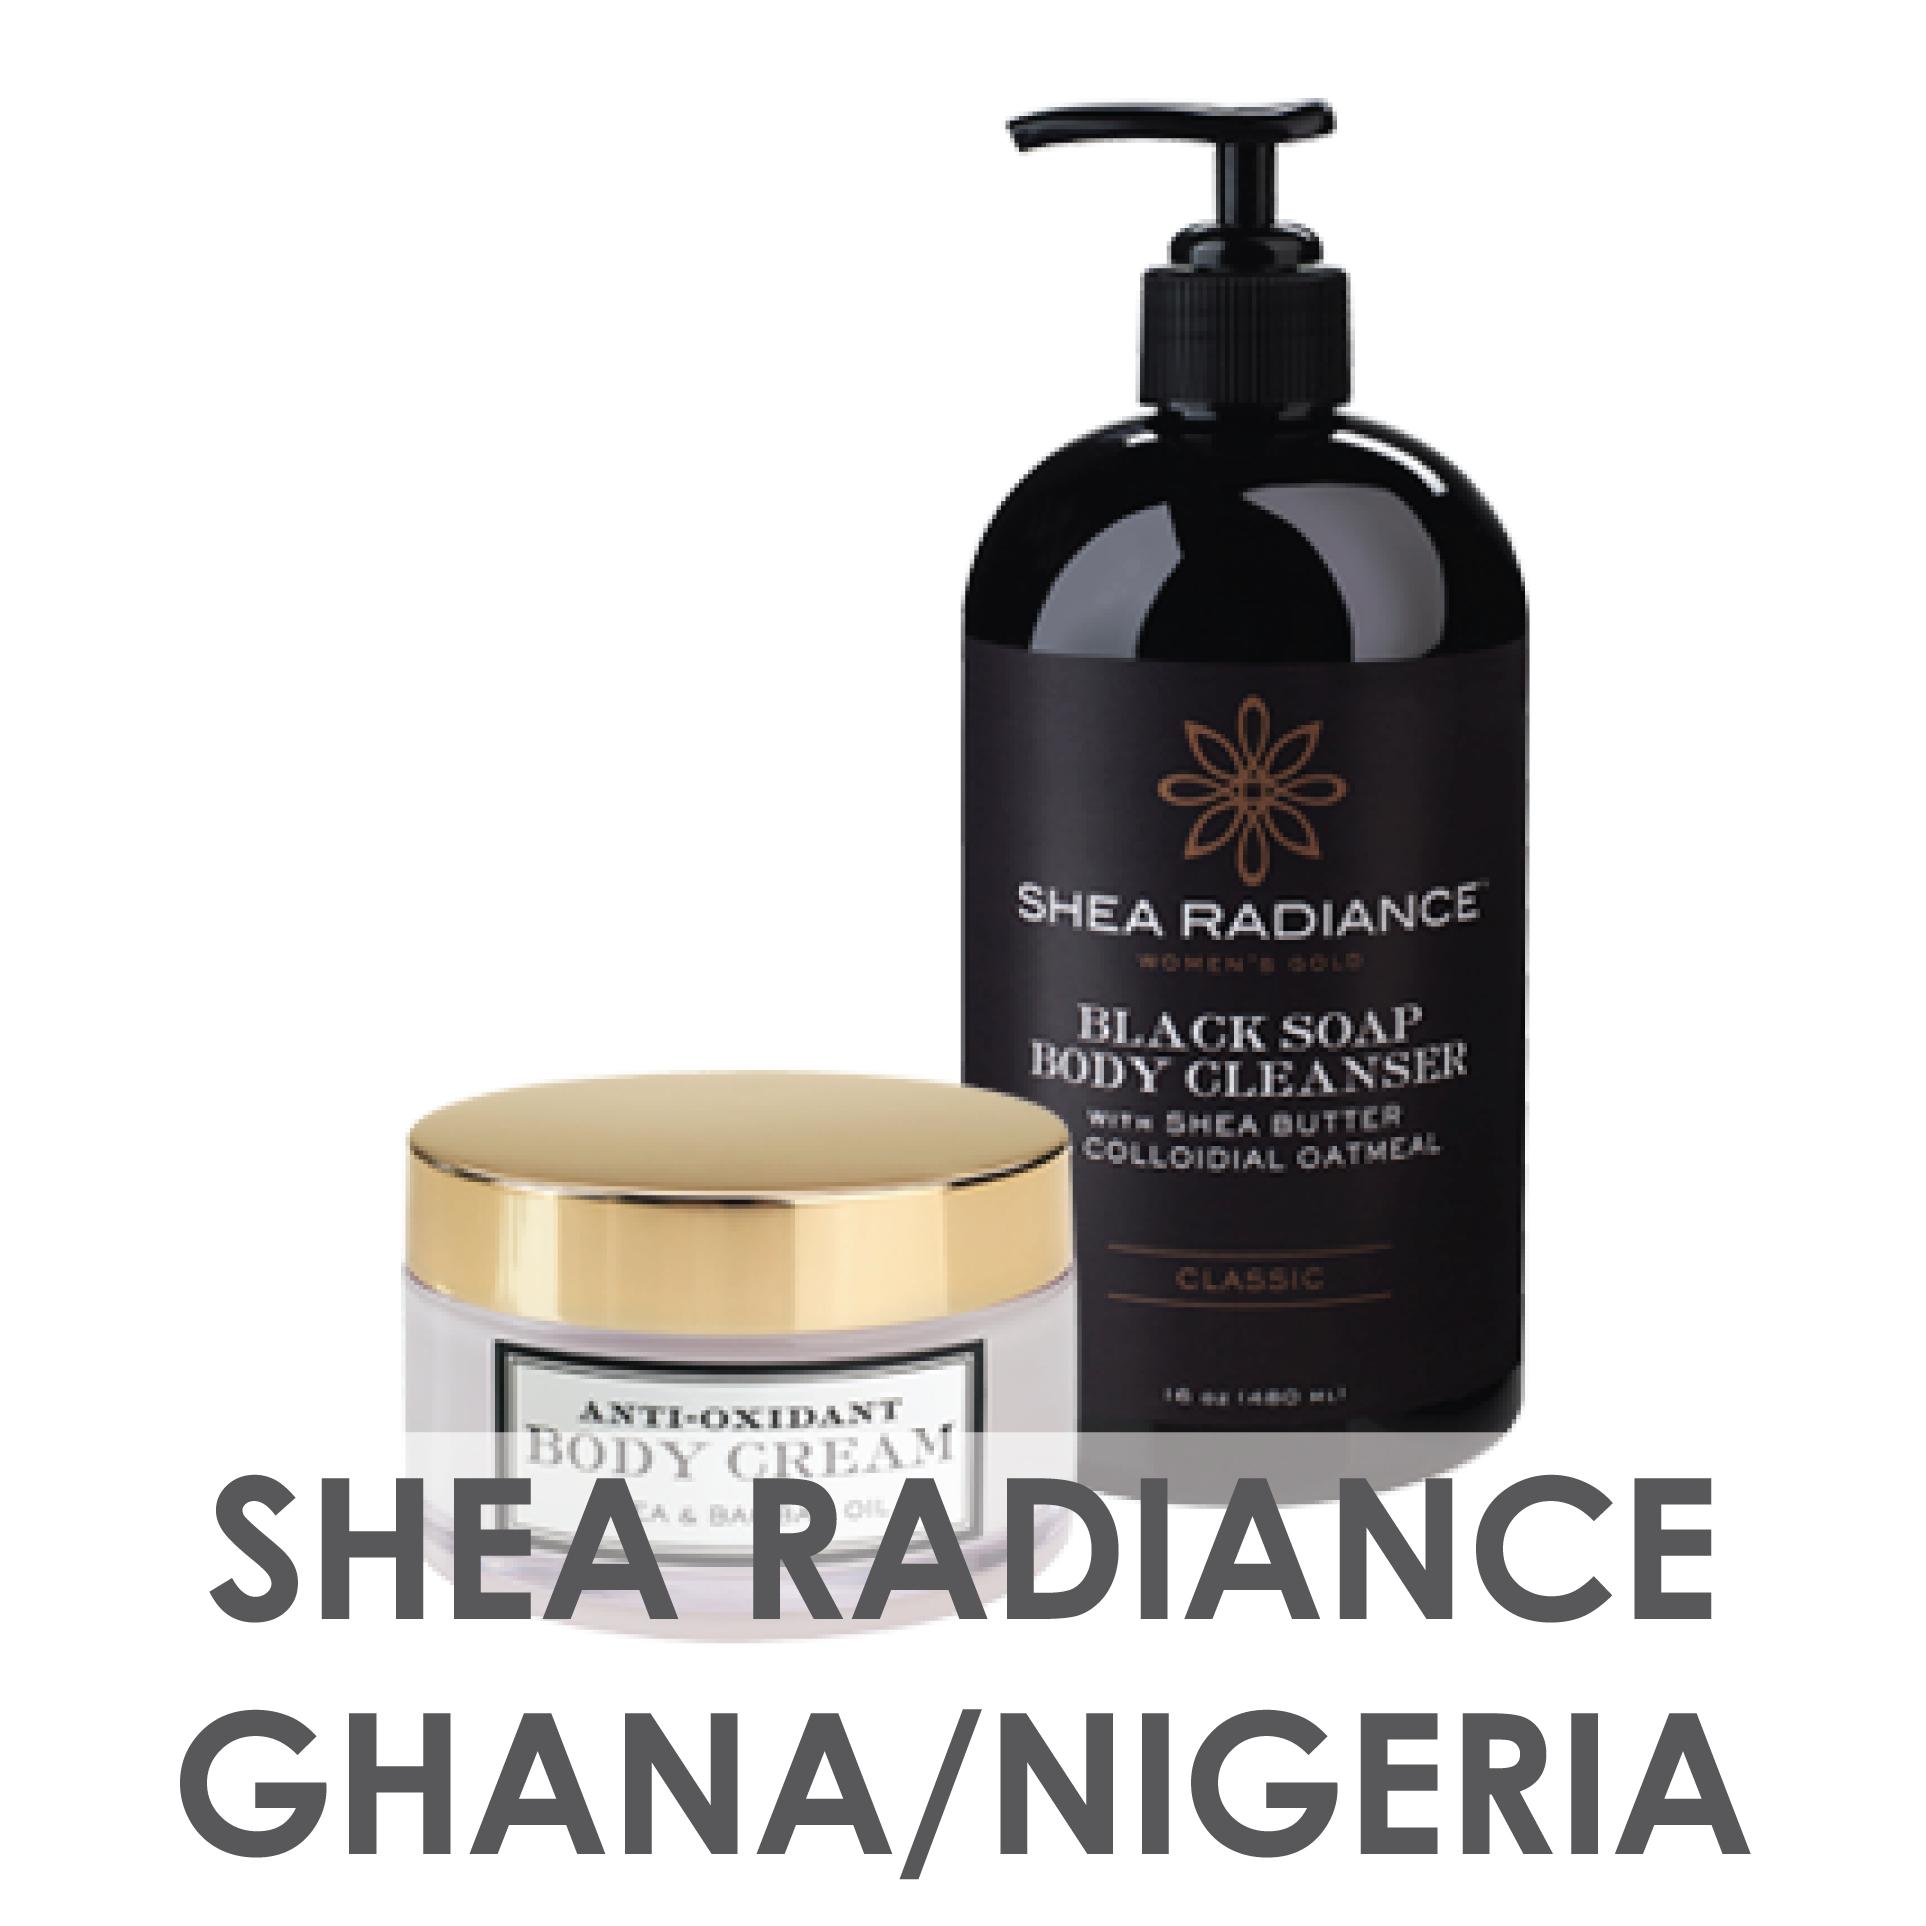 GHANA/NIGERIA